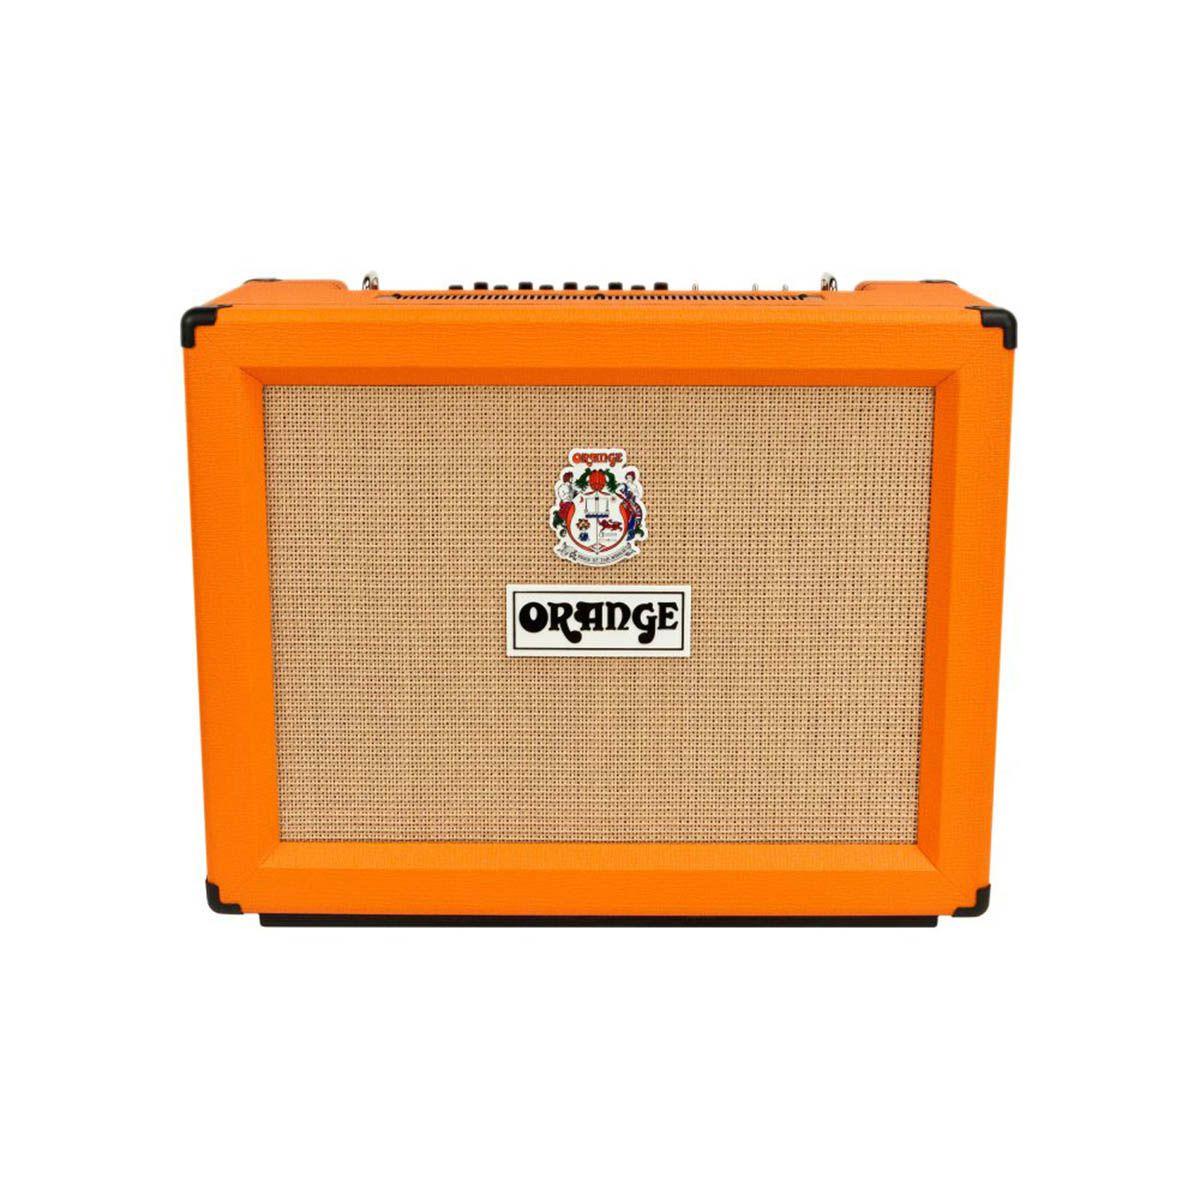 Caixa Amplificada Orange AD30TC 2x12 30W para Guitarra